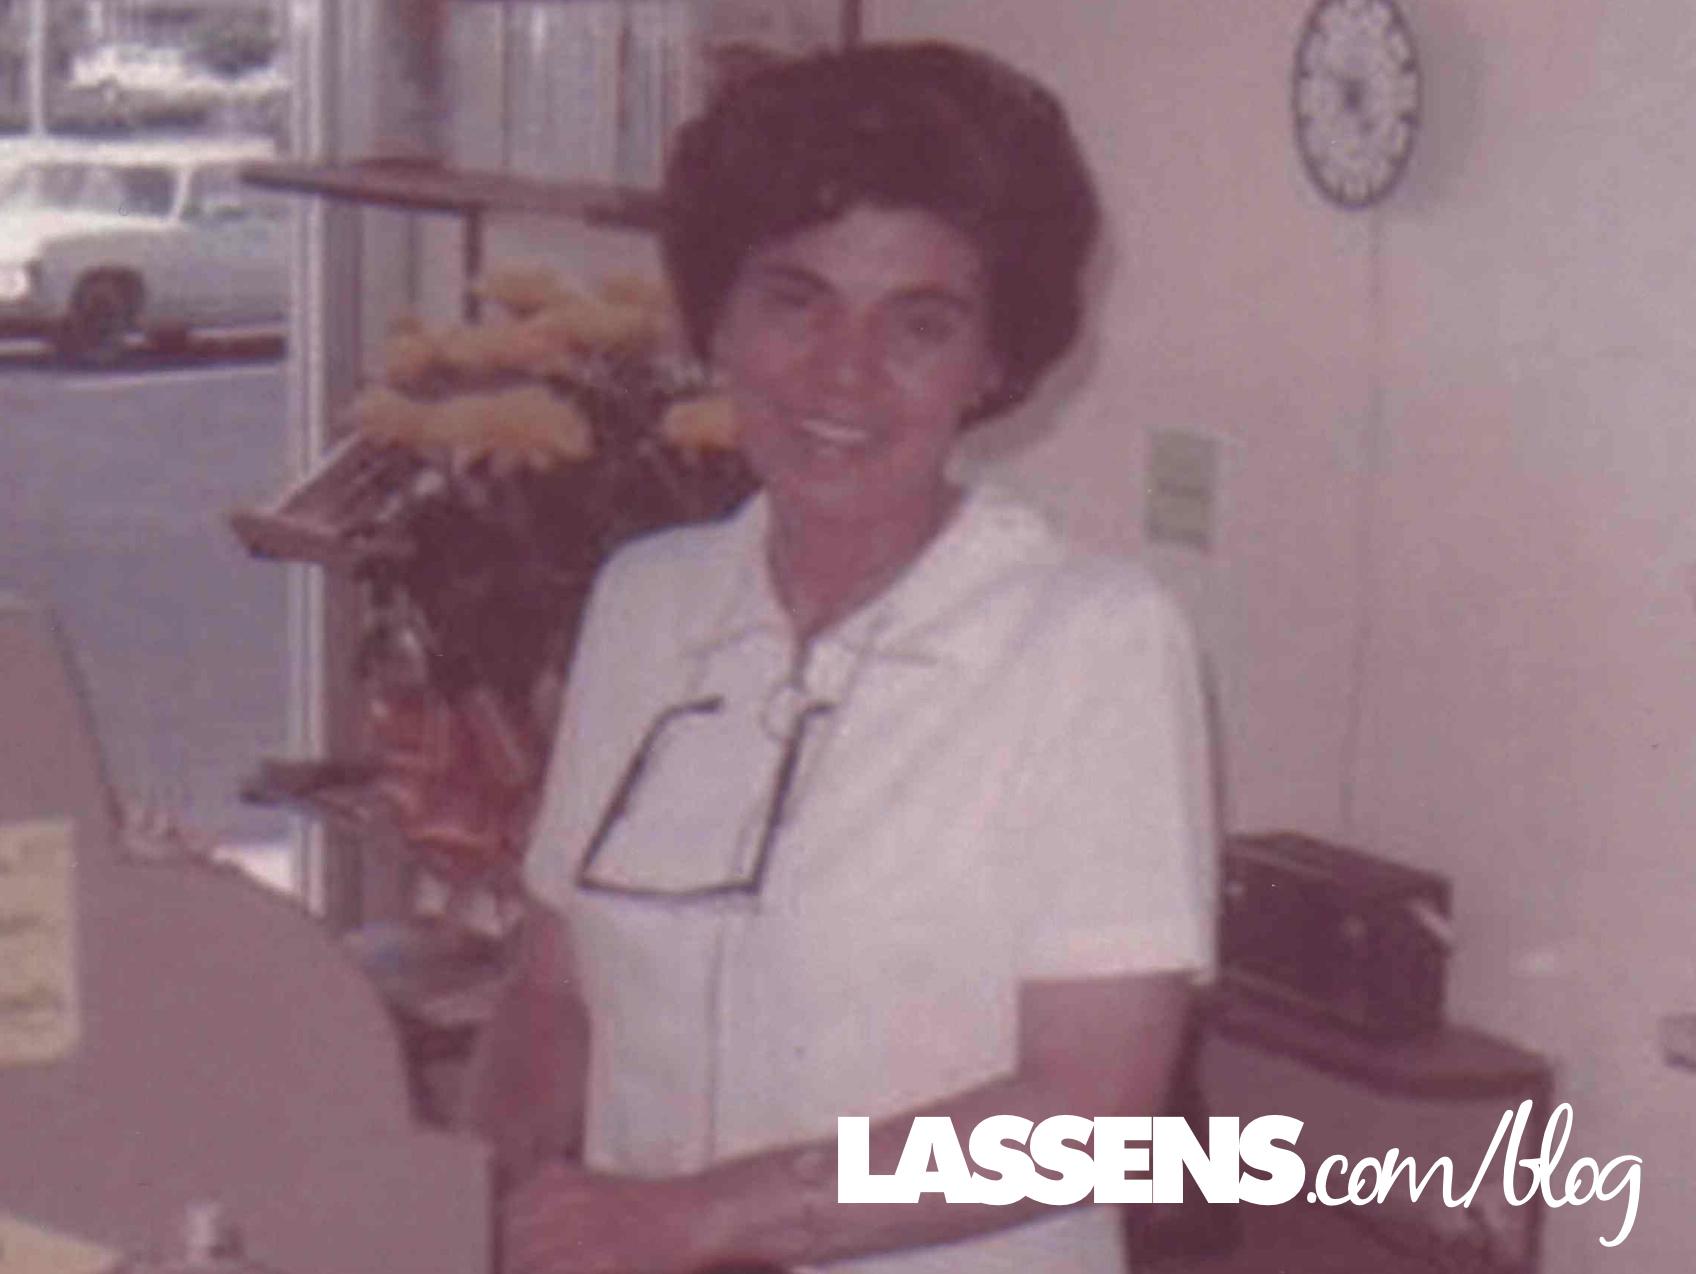 Oda+Lassen, Lassen's+Origin+Story, Lassen's+Anniversary